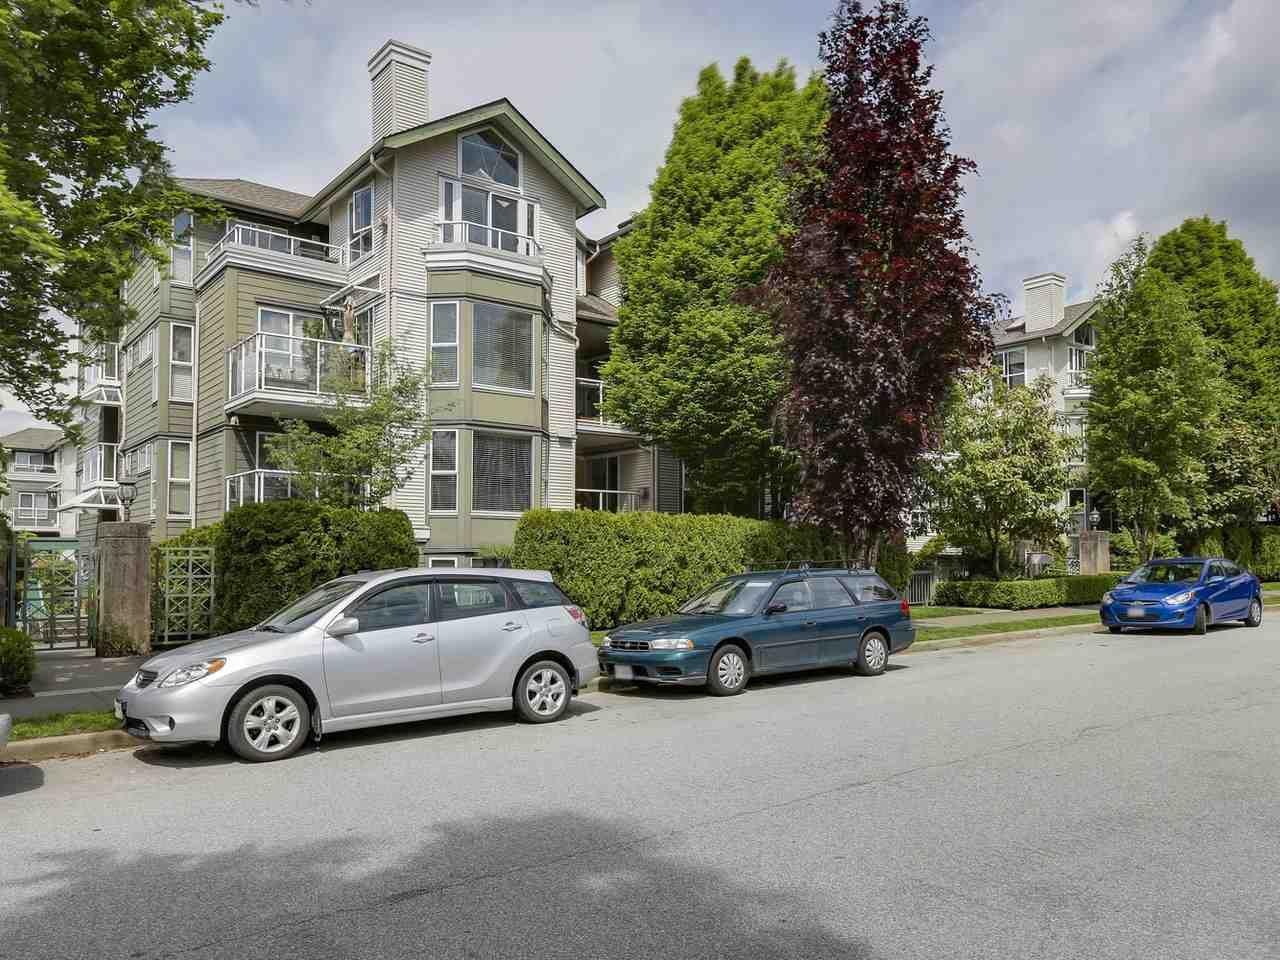 Main Photo: 305 225 E 19TH AVENUE in Vancouver: Main Condo for sale (Vancouver East)  : MLS®# R2173702